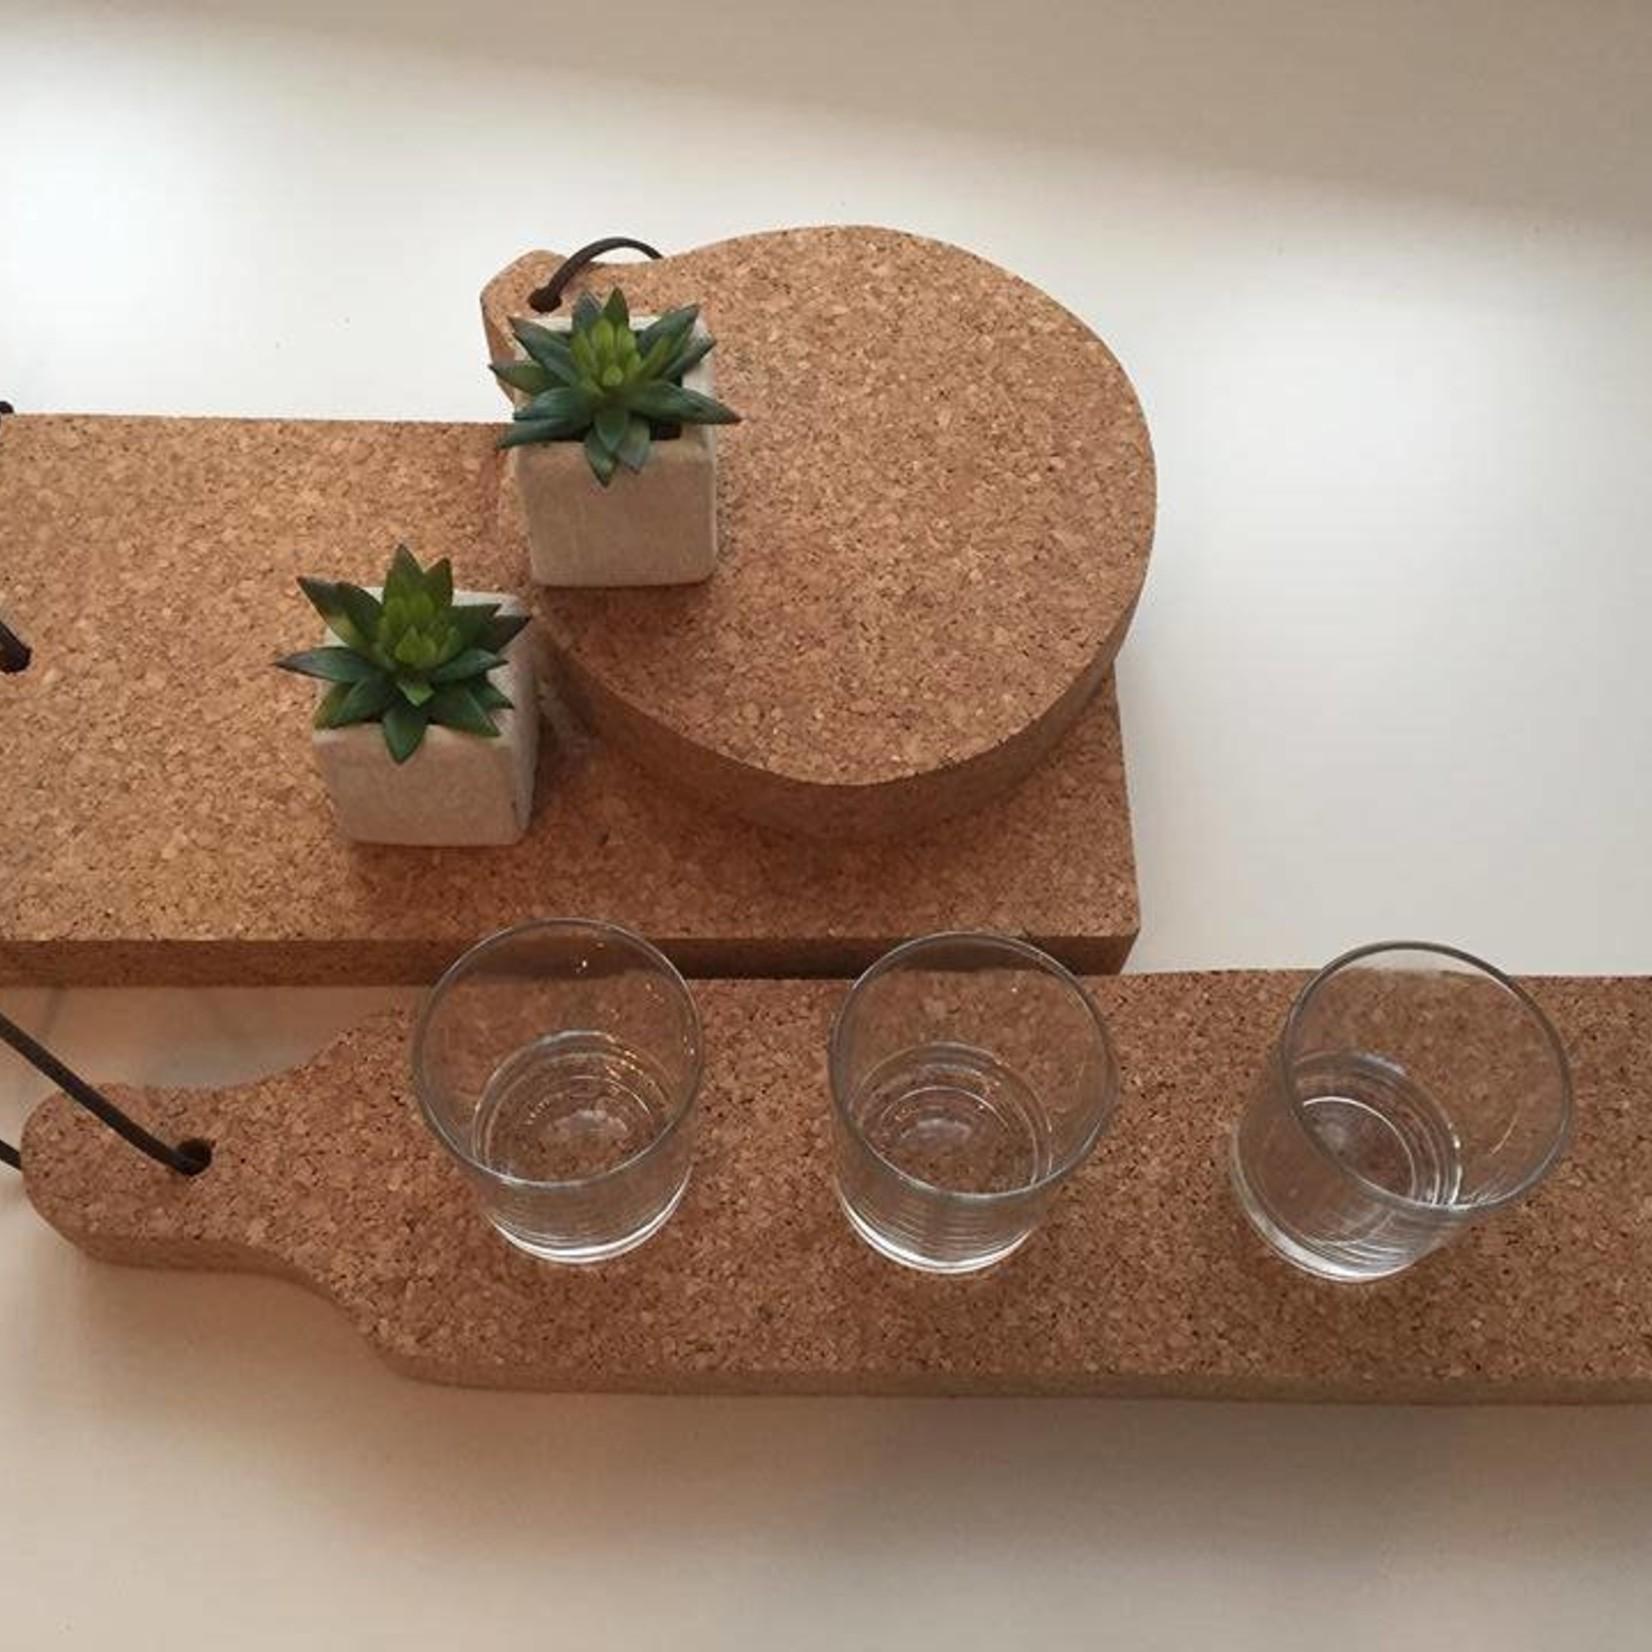 3D Cork Serveerplank - Kurk - Rechthoekig